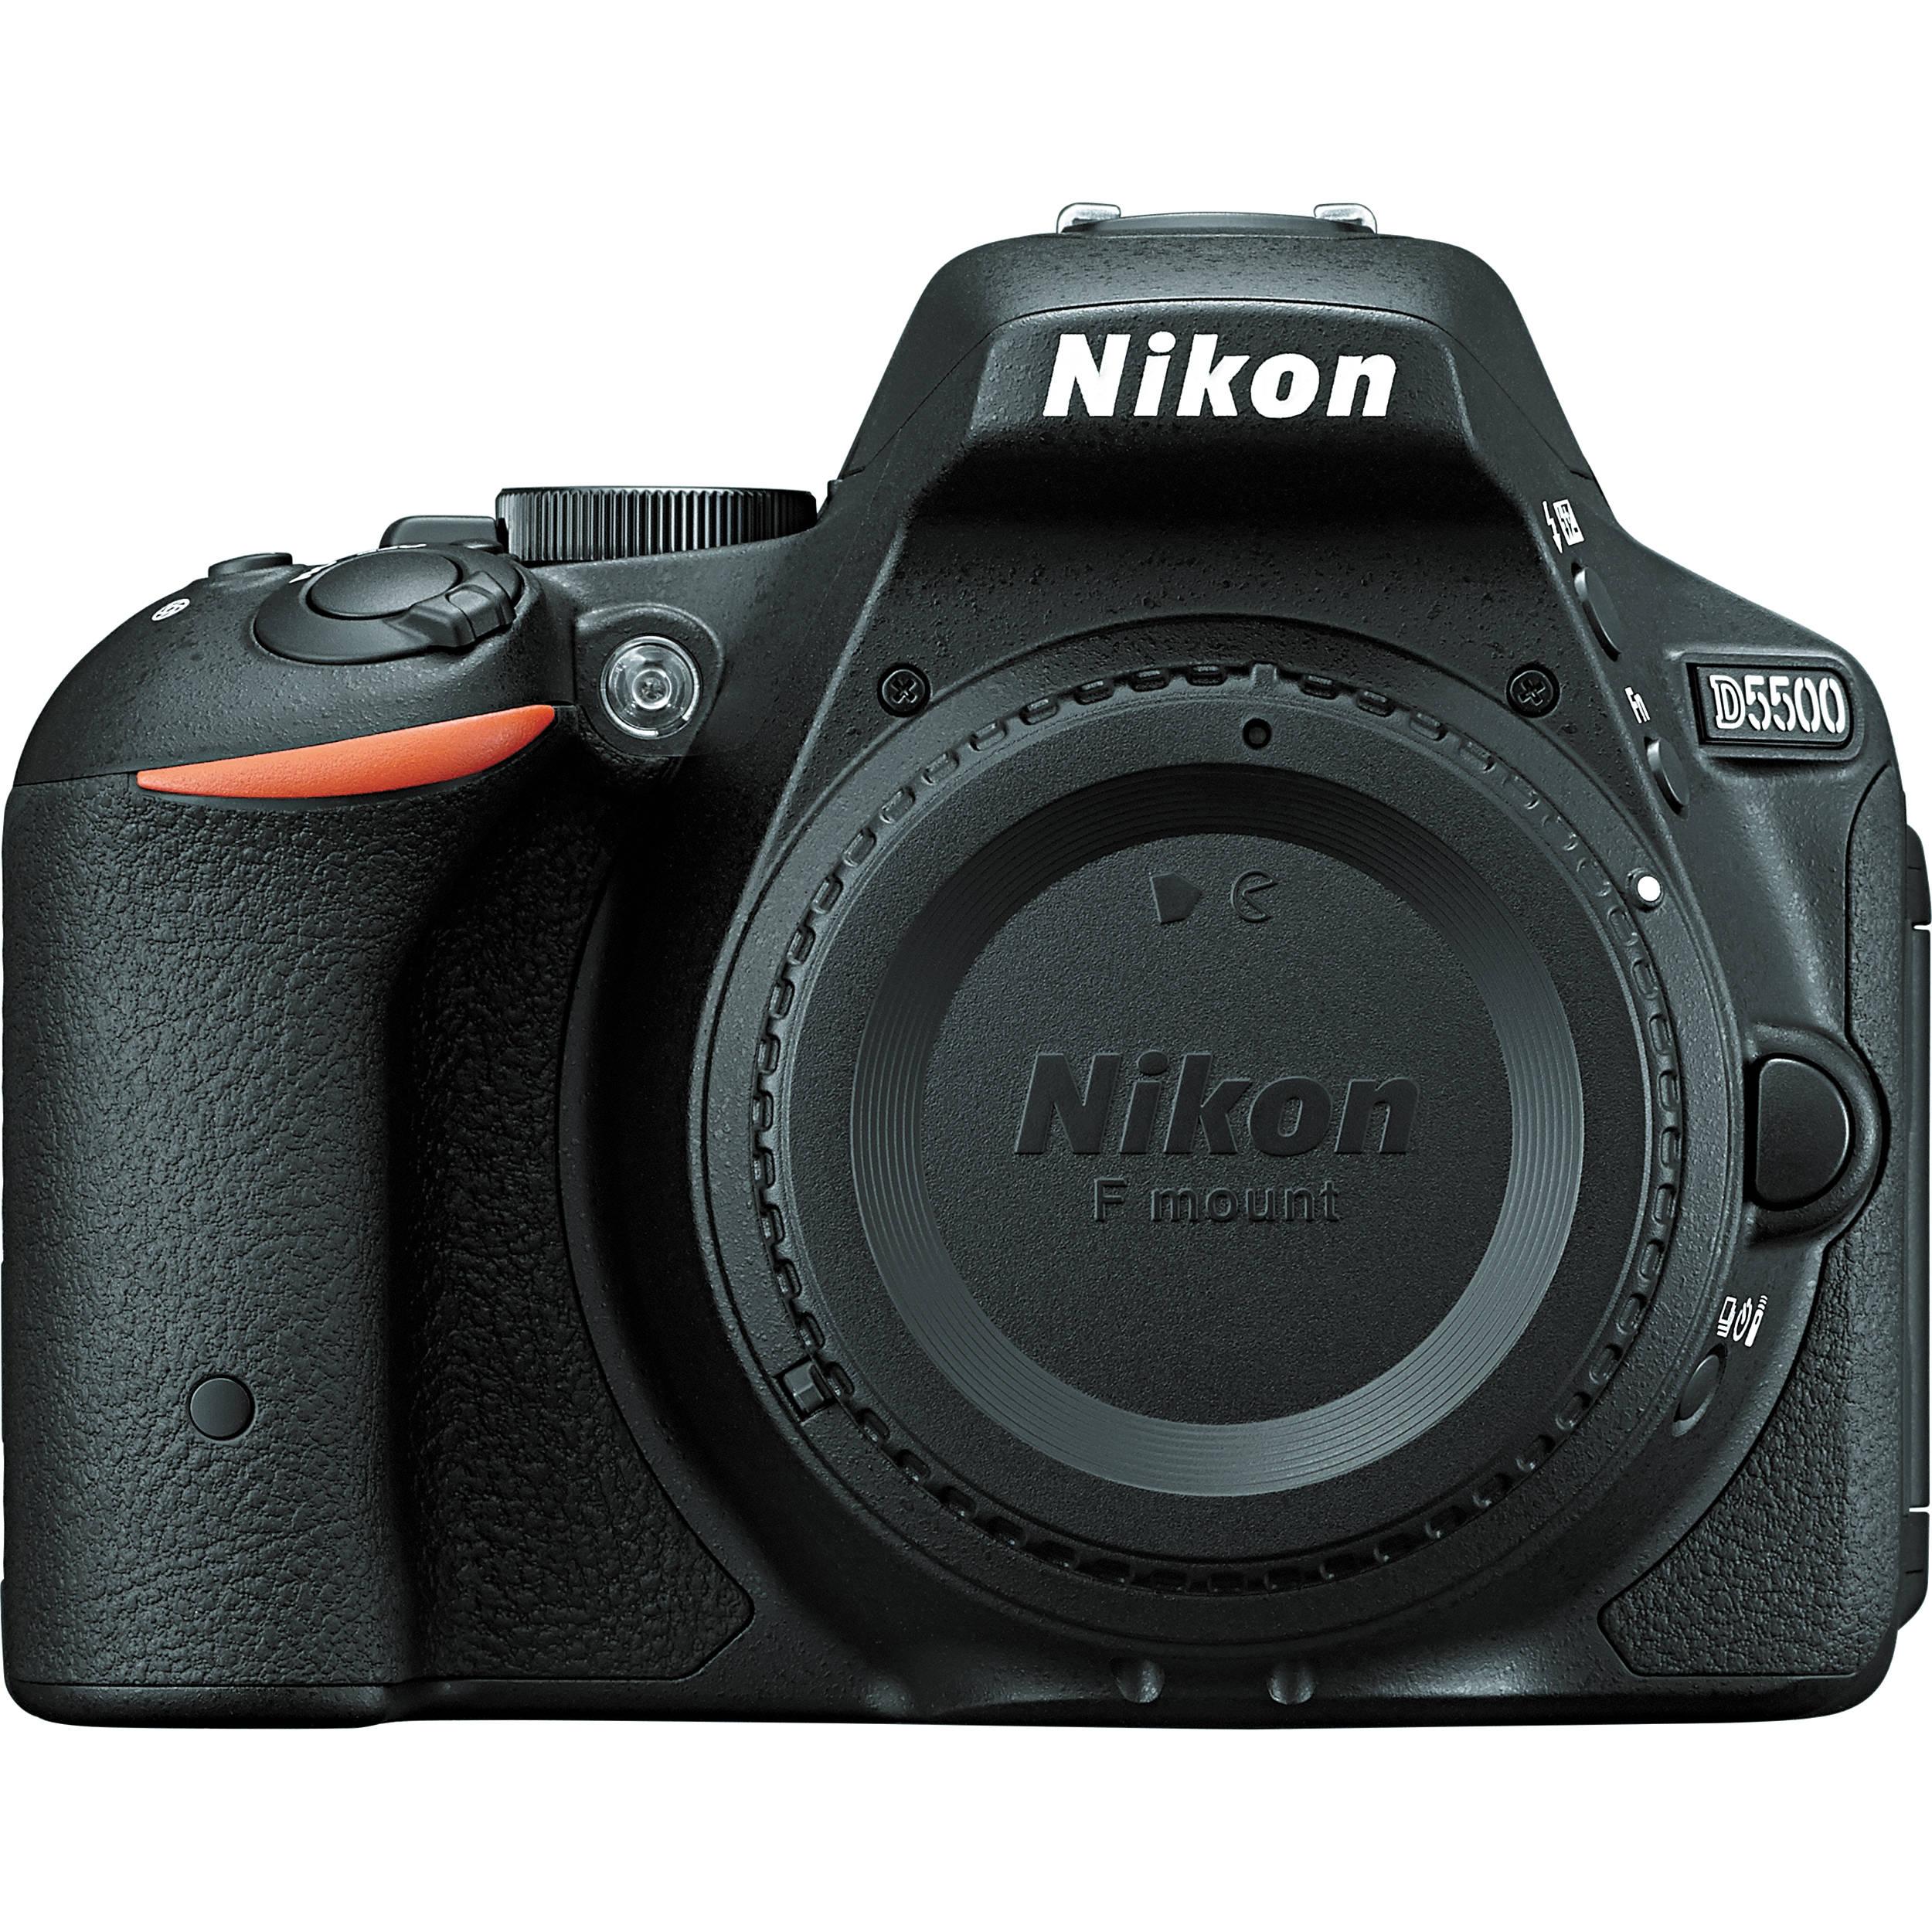 Nikon D5500 DSLR Camera (D5500 Body, Black) B&H Photo Video